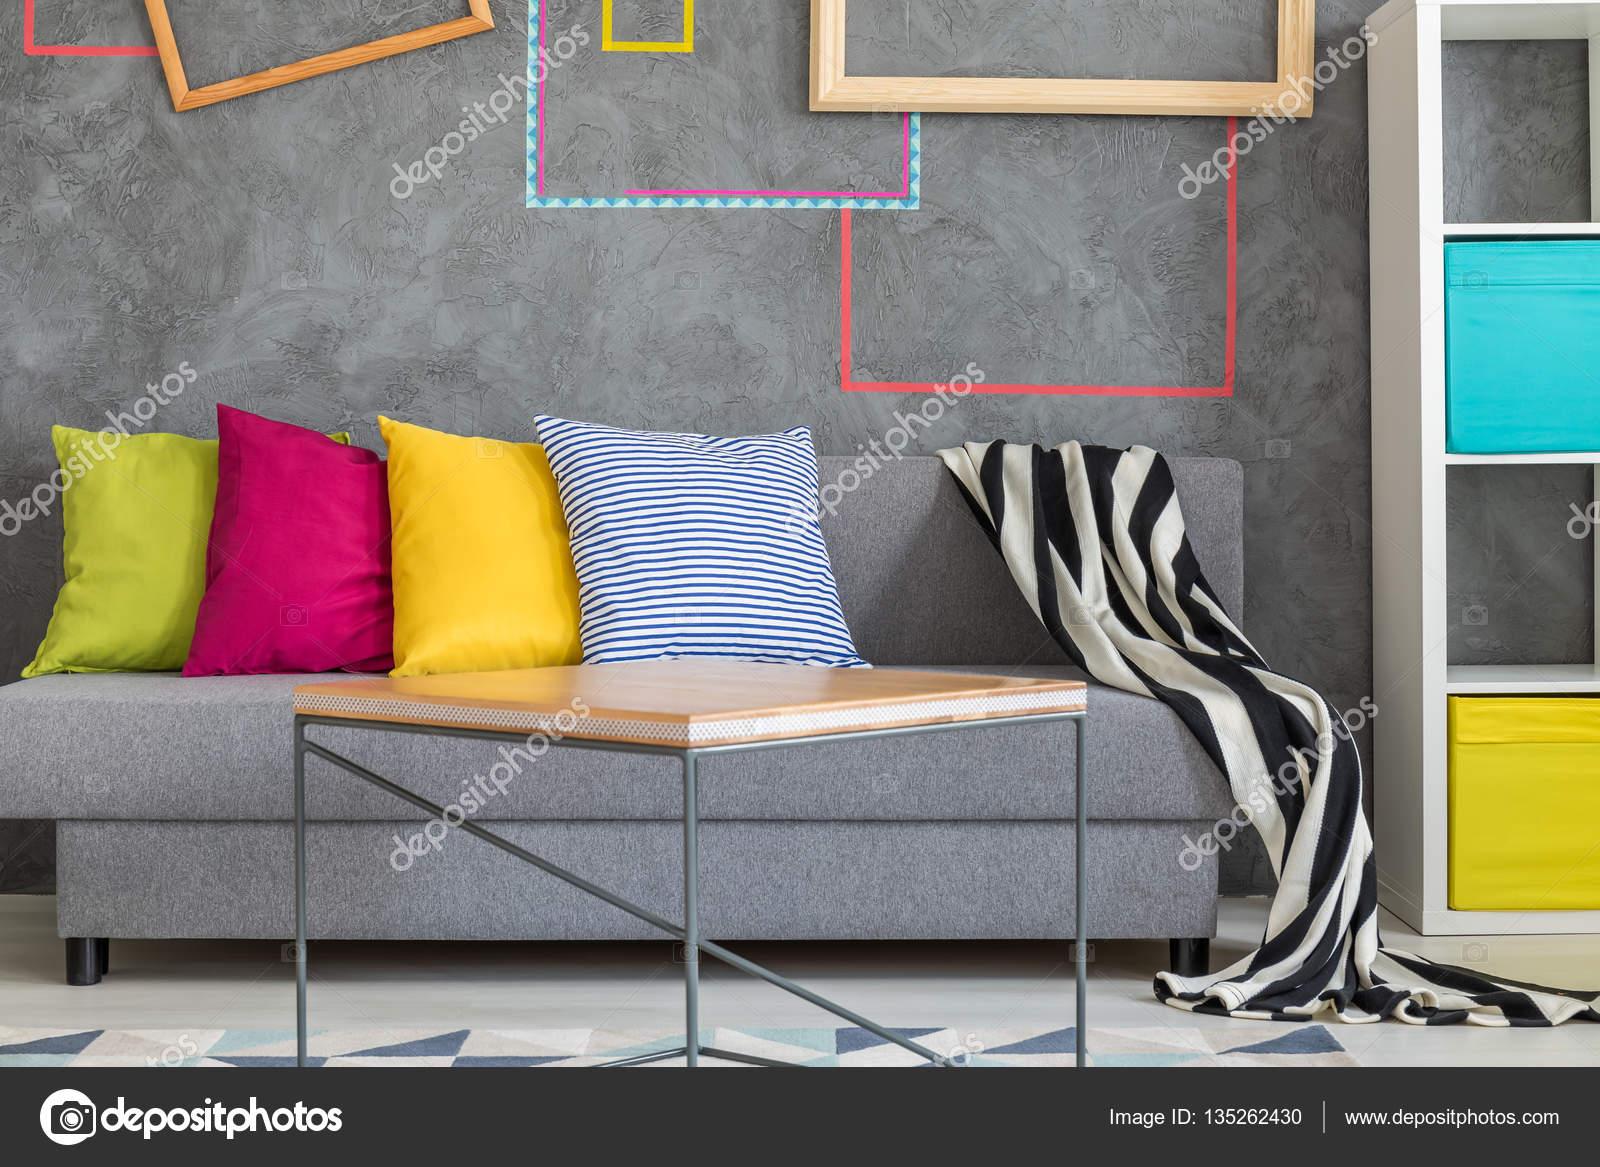 Divano Cuscini Colorati.Grey Sofa With Colorful Pillows Stock Photo C Photographee Eu